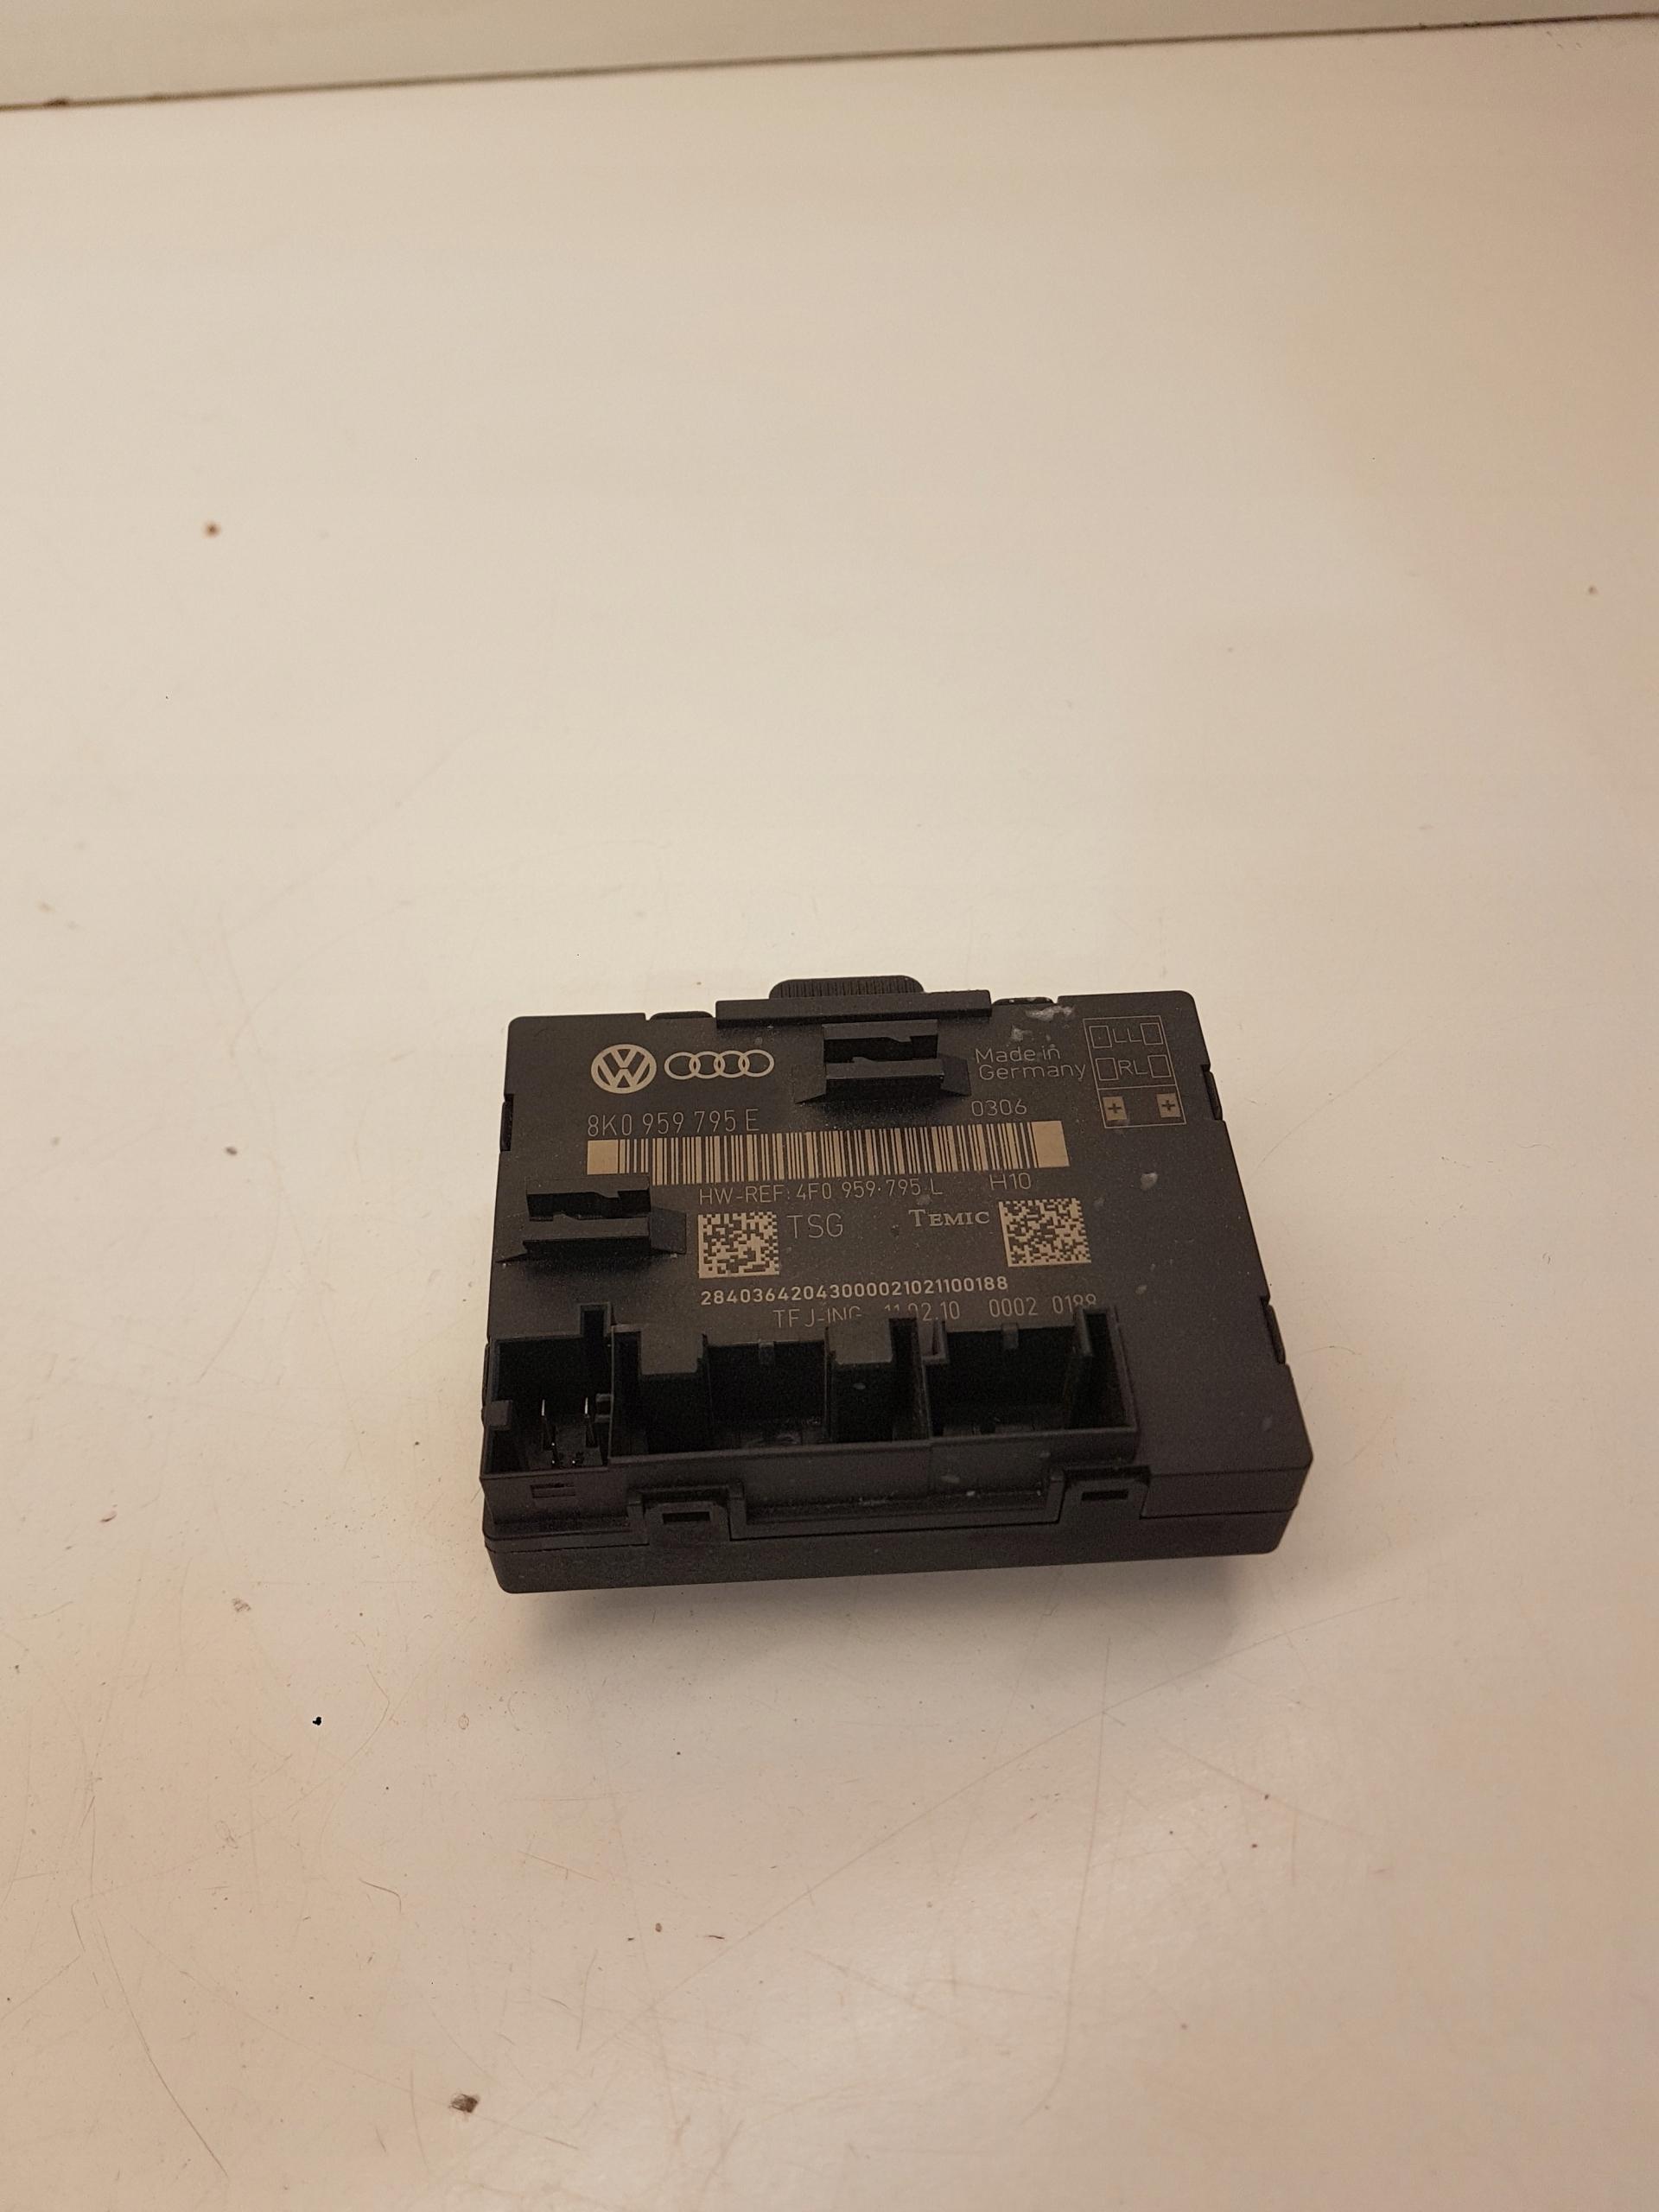 модуль драйвер двери audi a4 b8 a5 q5 8k0959795e